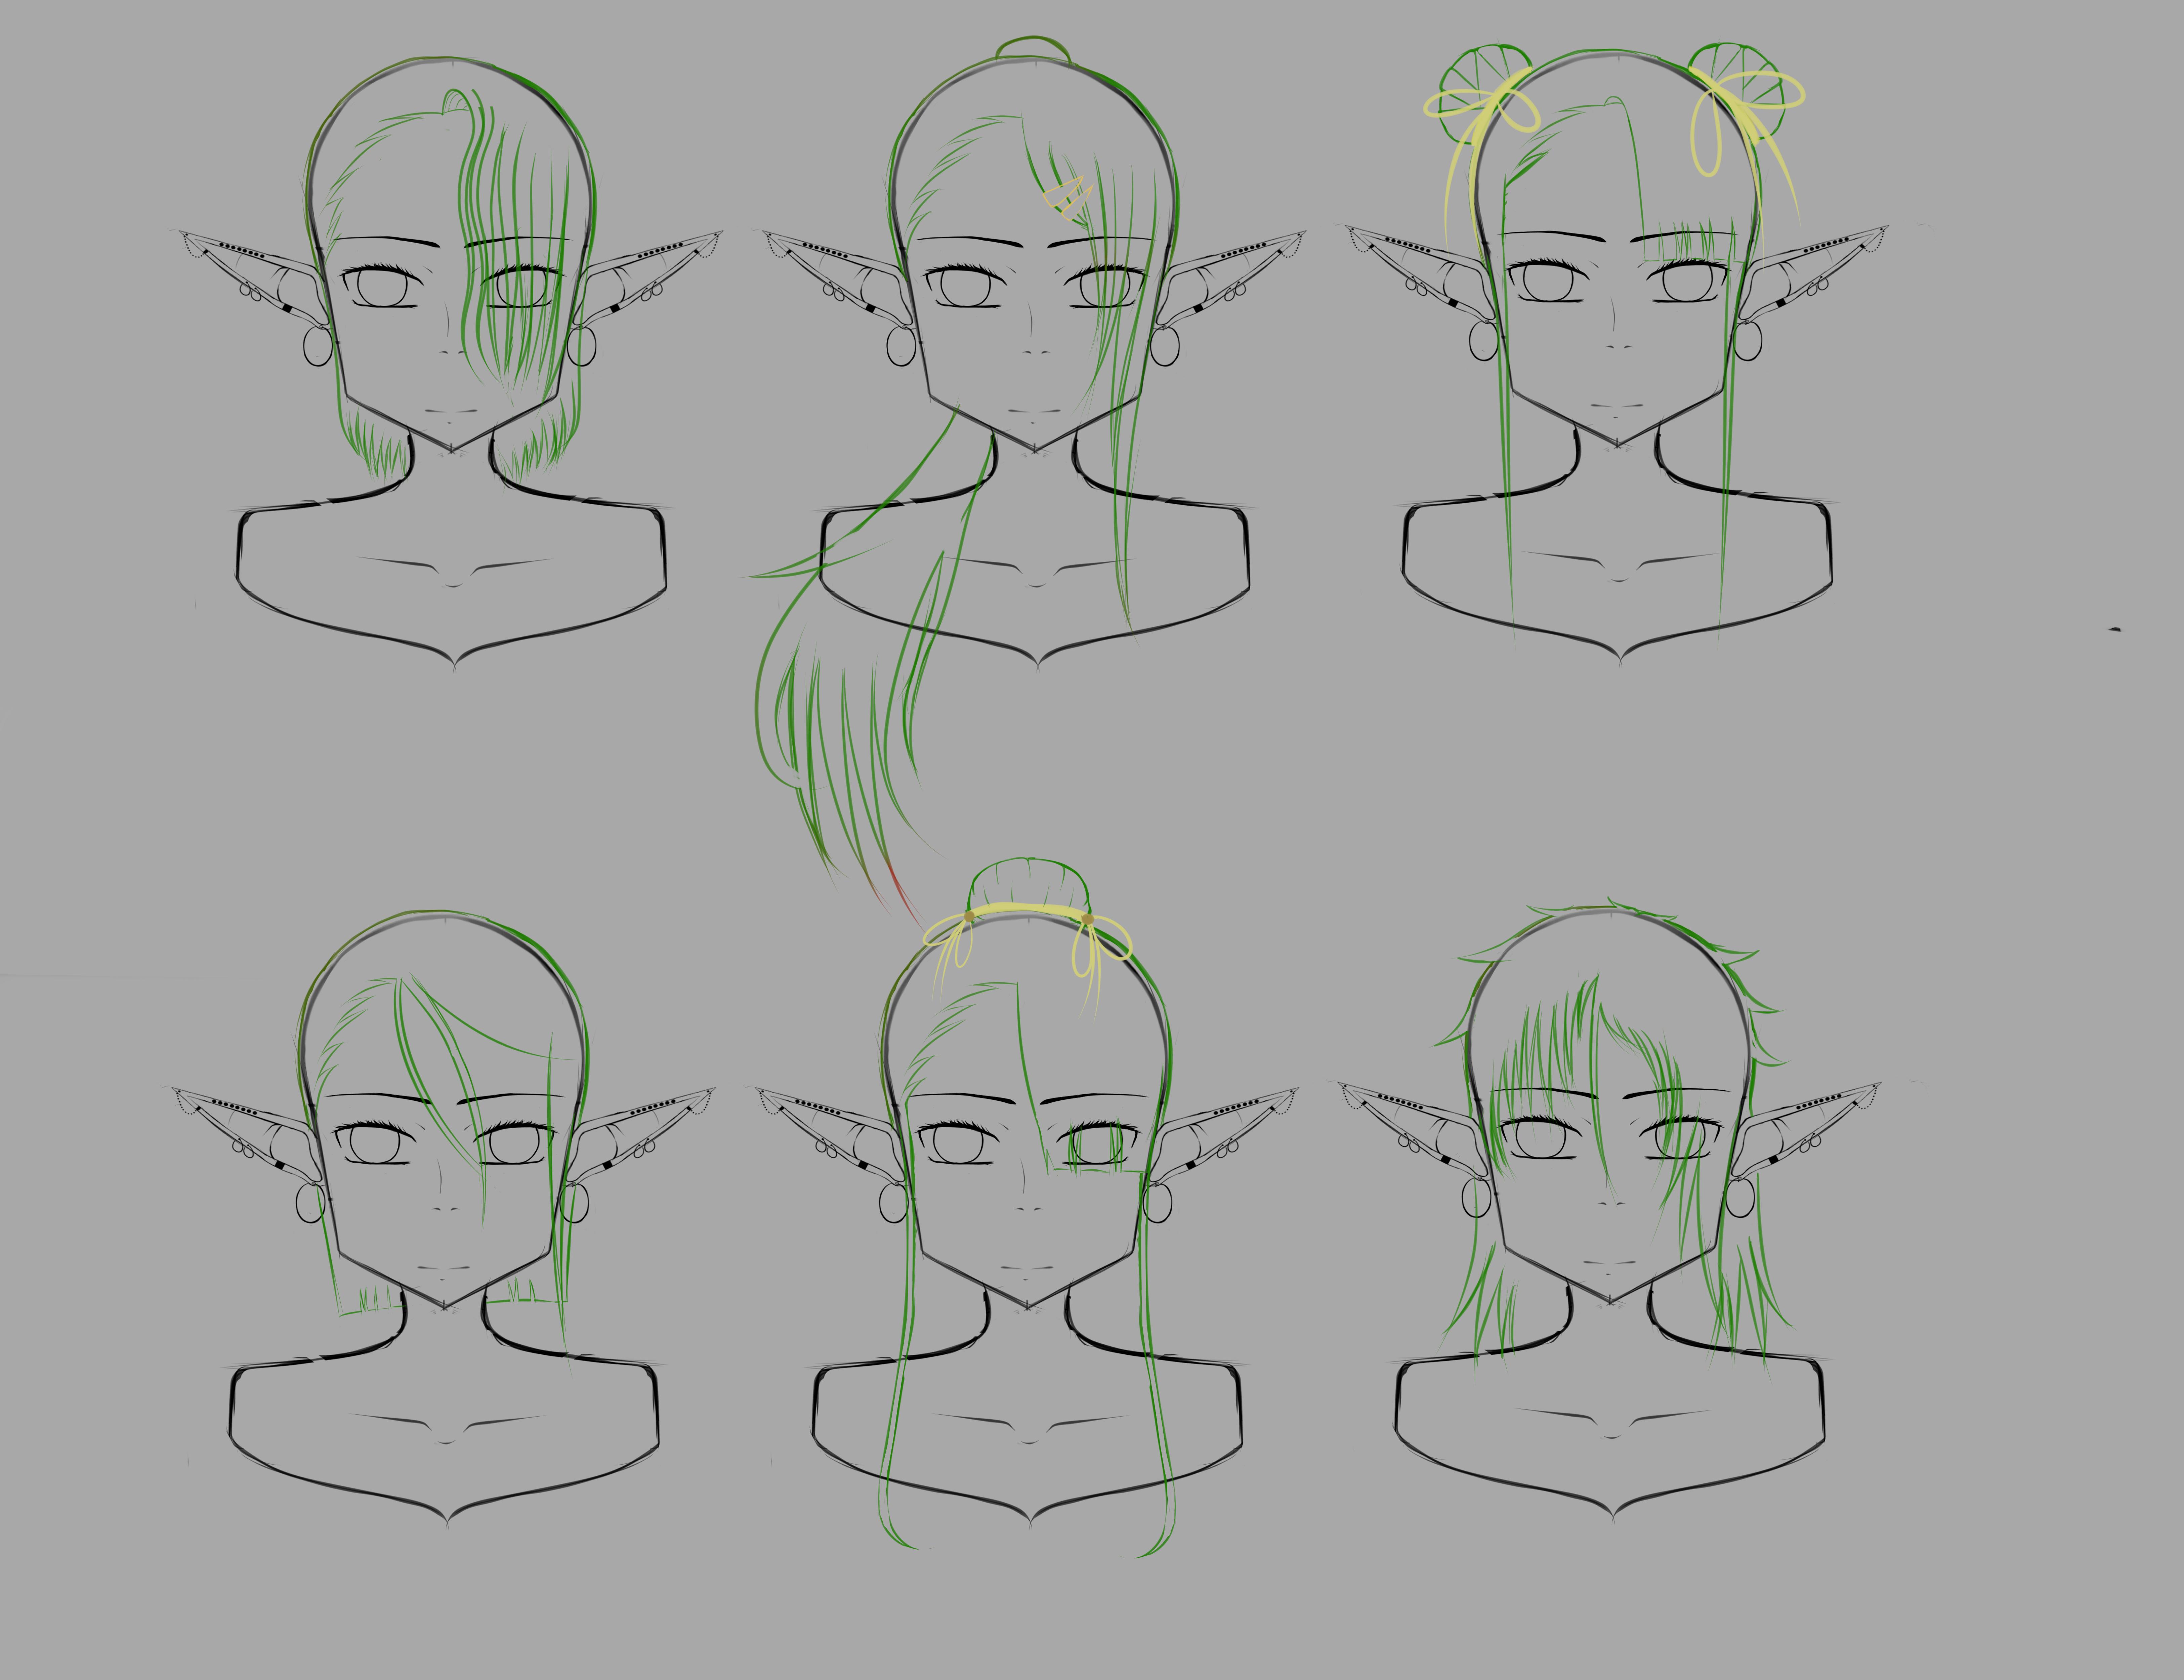 Mirai Character Development by Makia42